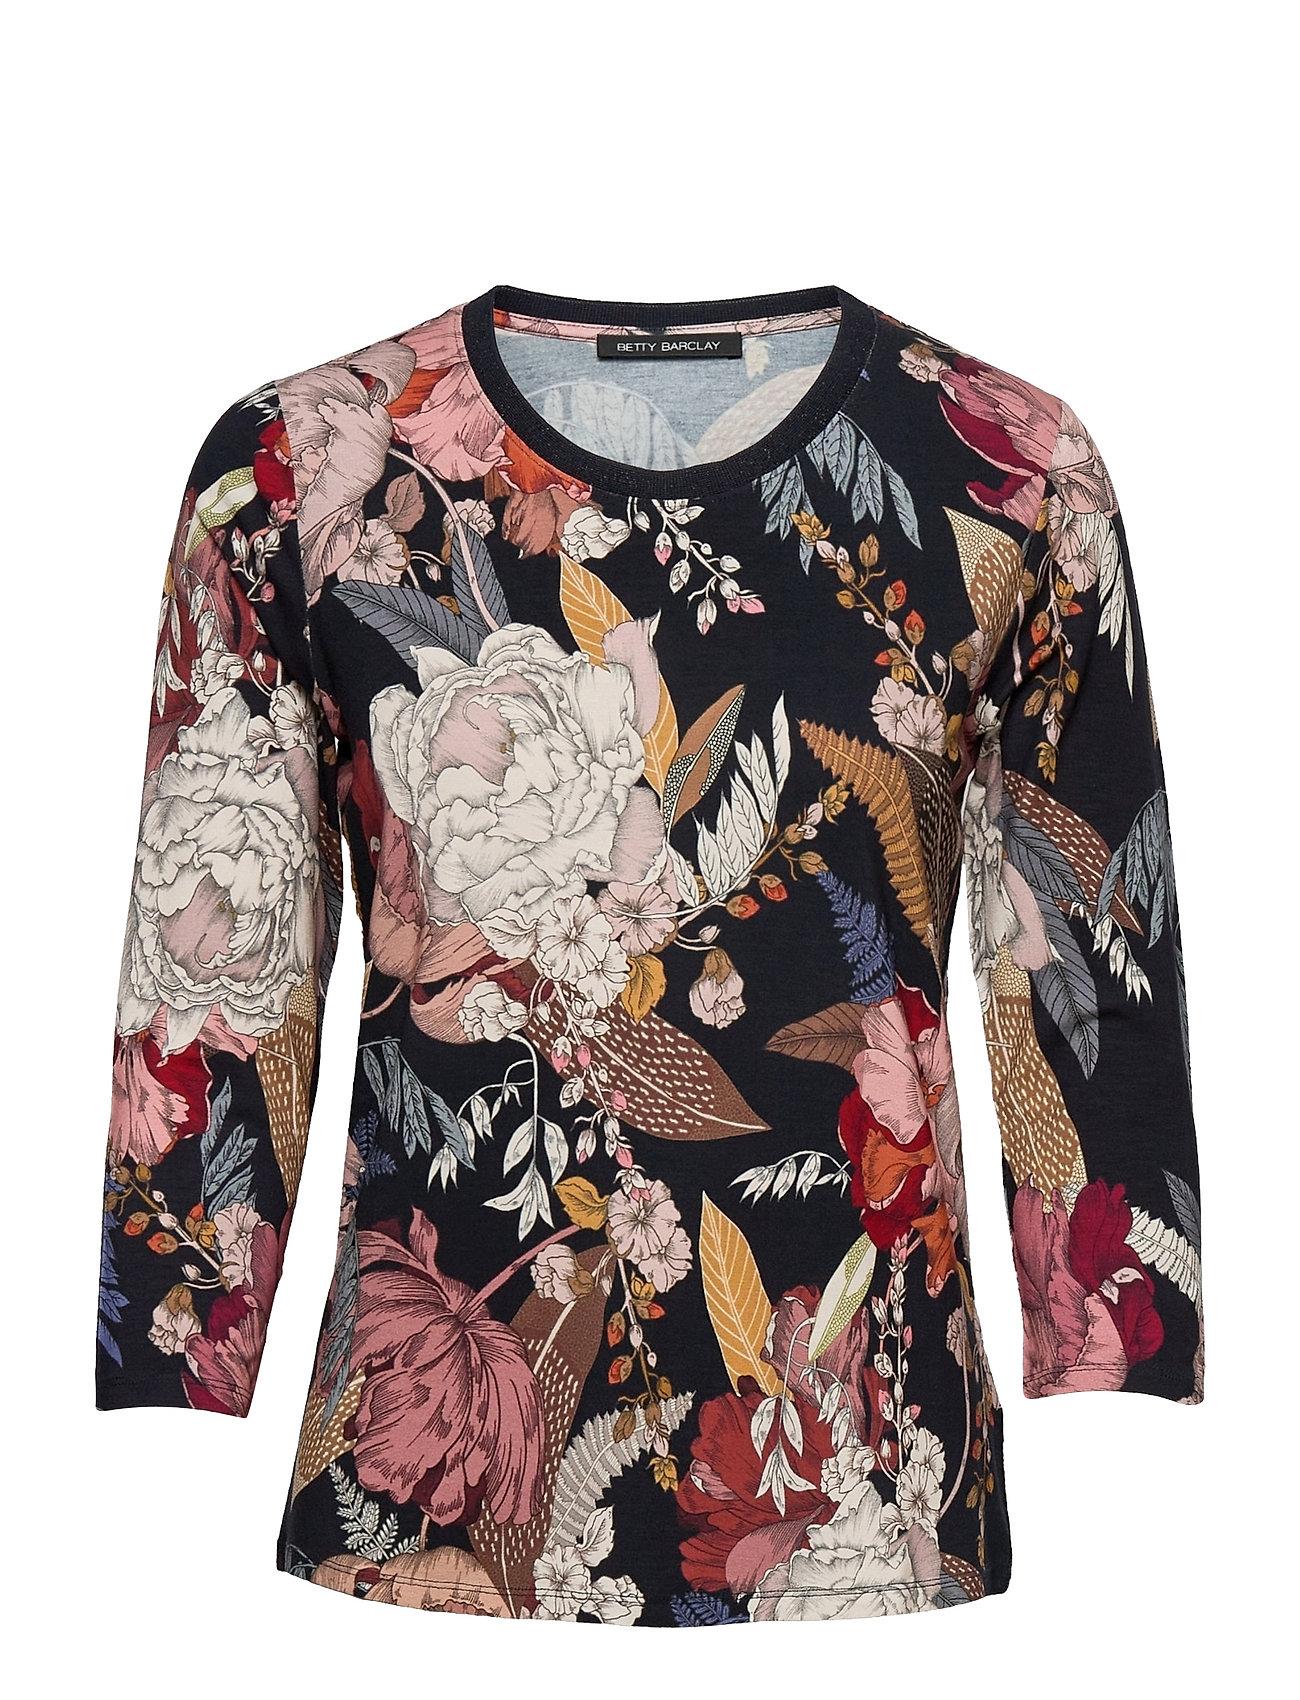 Shirt Short 3/4 Sleeve Langærmet T-shirt Multi/mønstret Betty Barclay